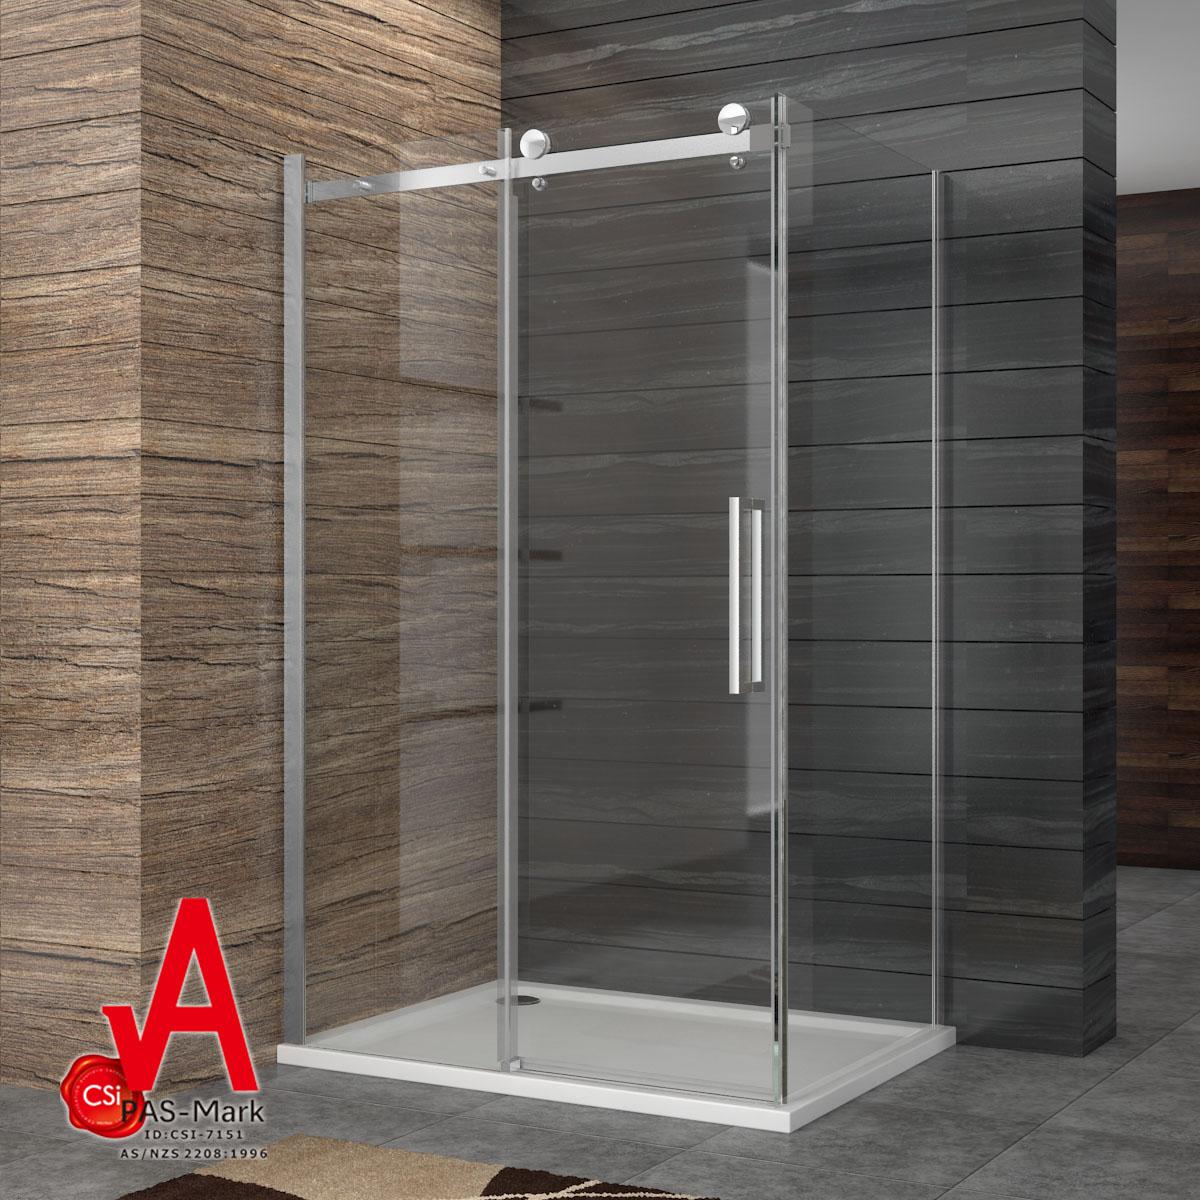 Details About Shower Screen Bottom Seal Frameless Sliding Door120 195cm Side Panel 80 90cm